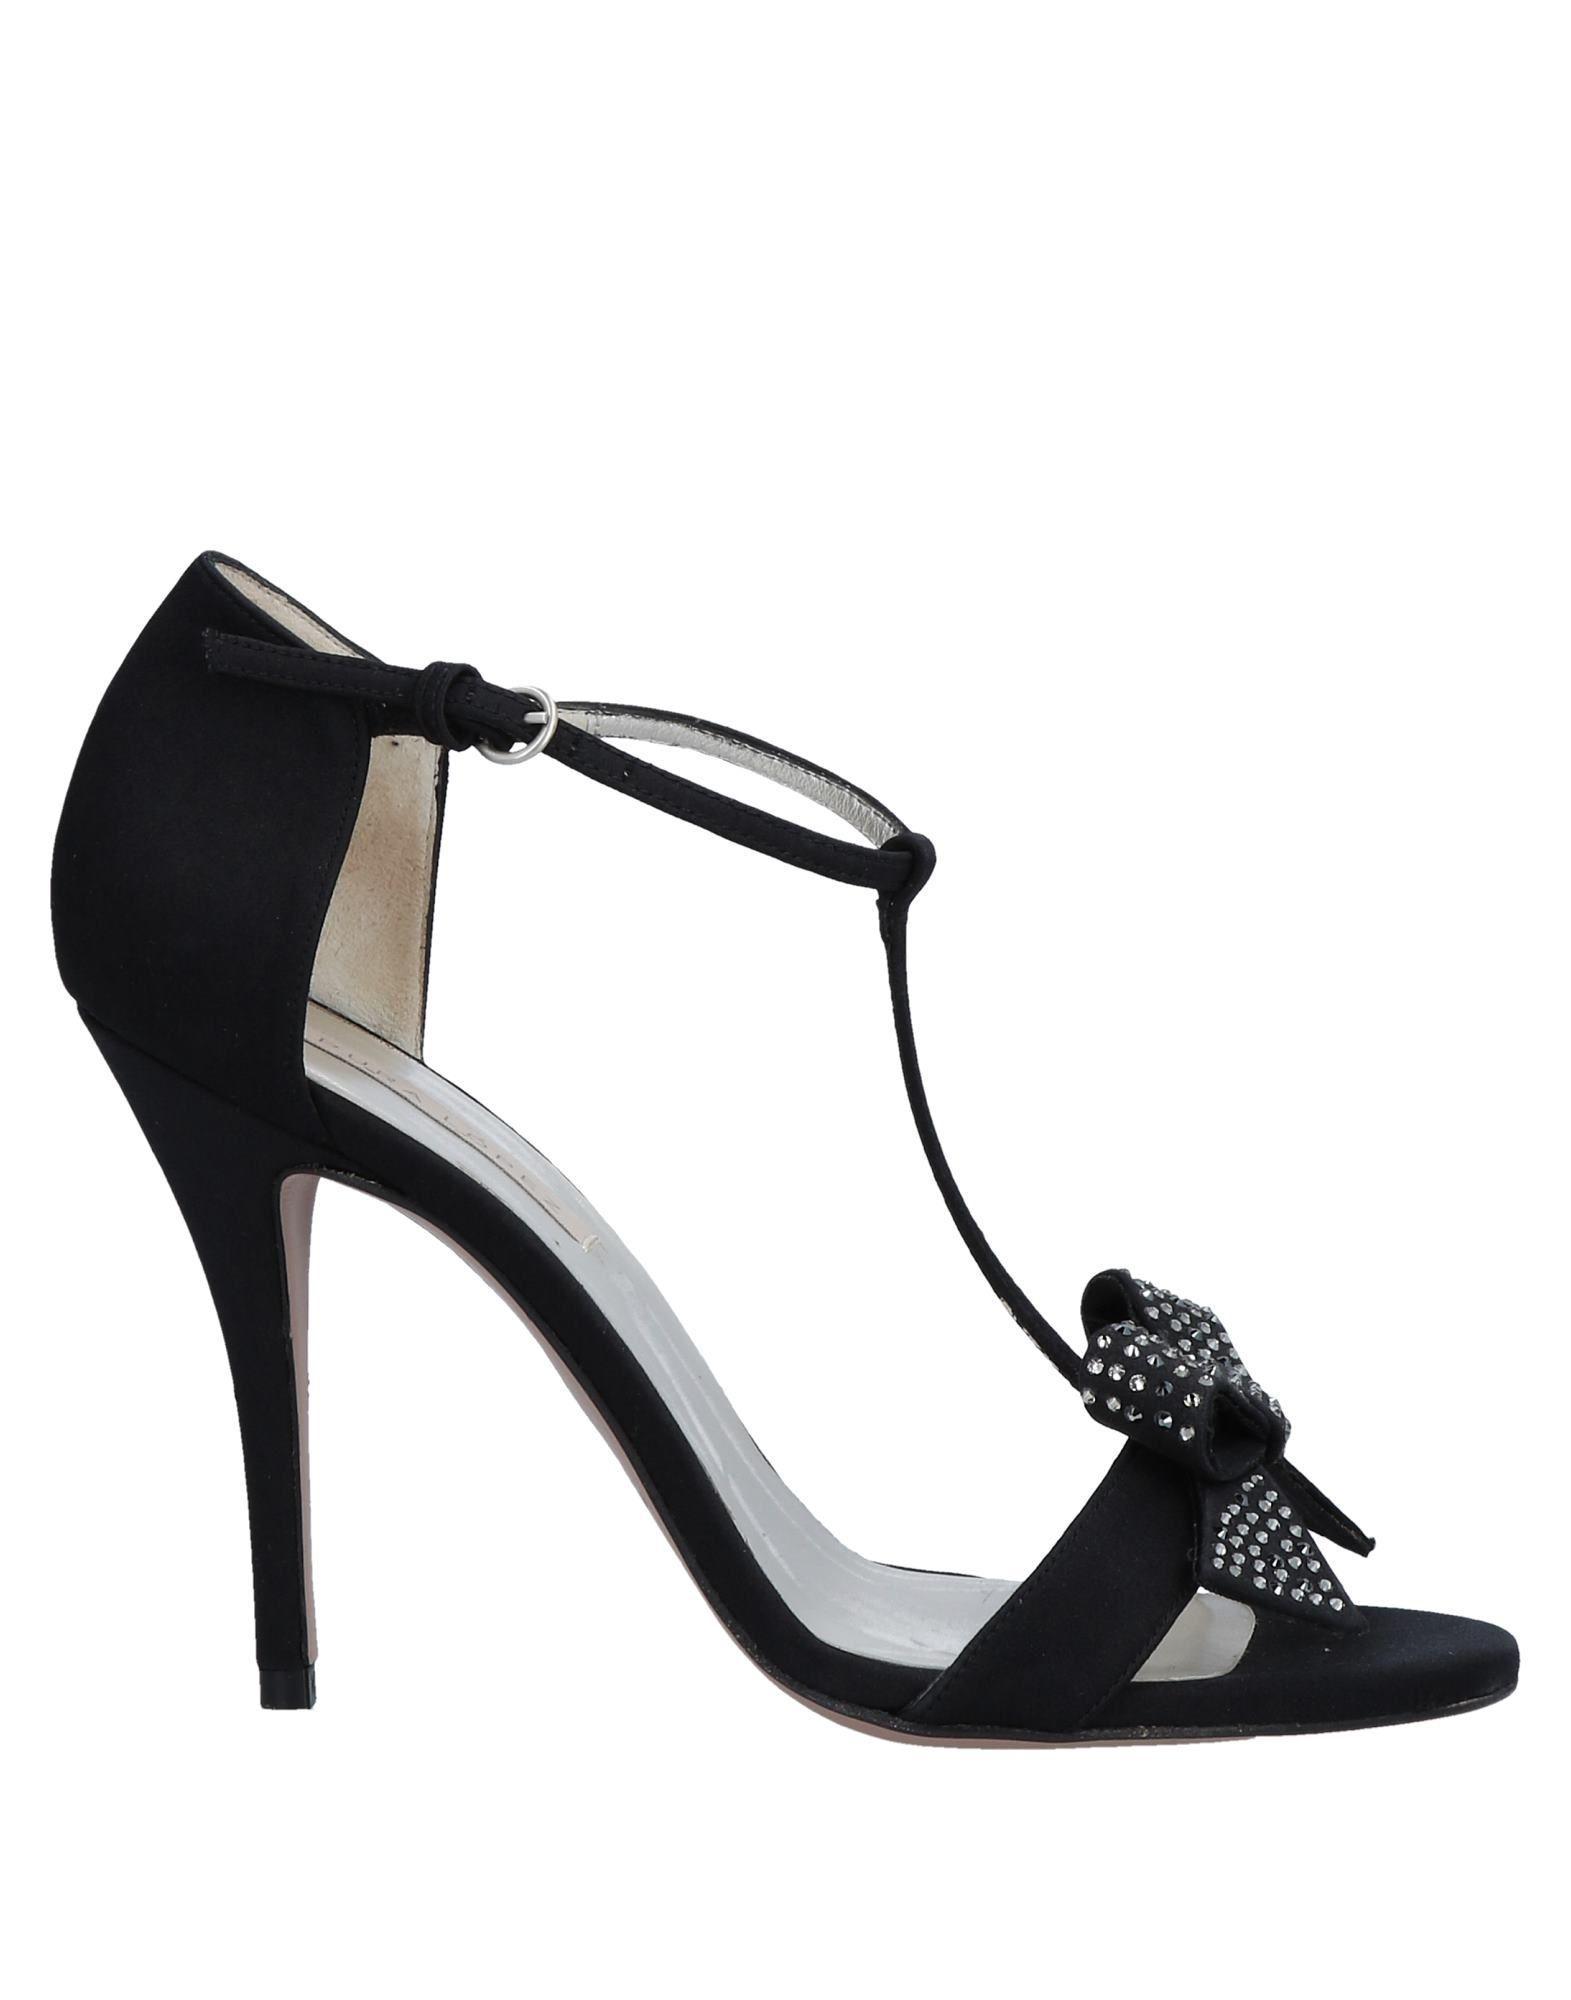 183afa82a19 Pura Lopez Sandals in Black - Lyst